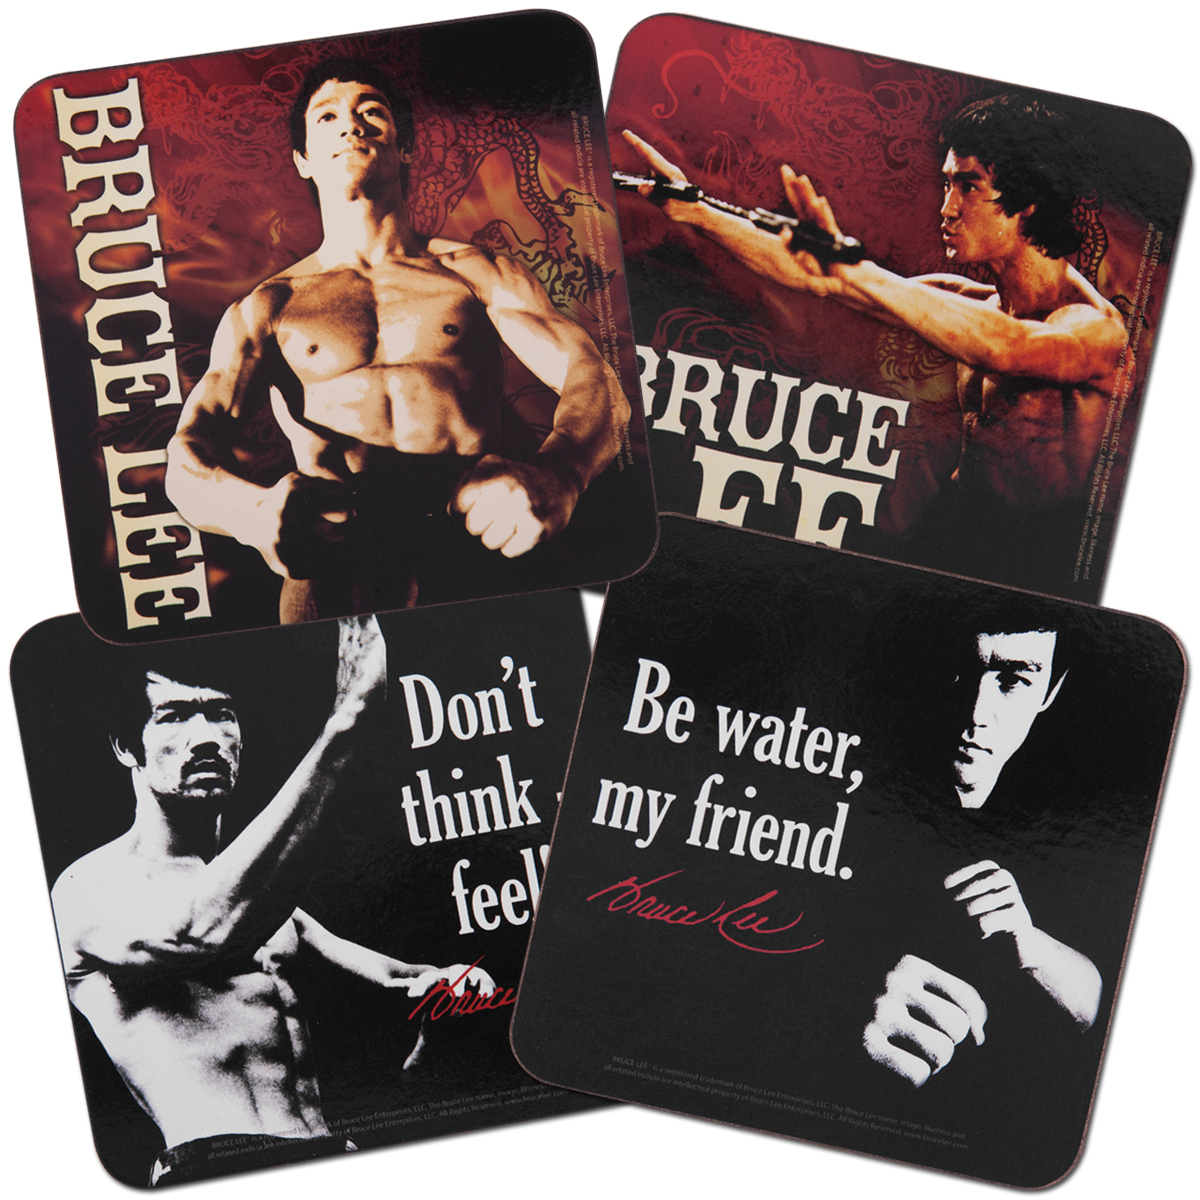 Bruce Lee Coaster Set